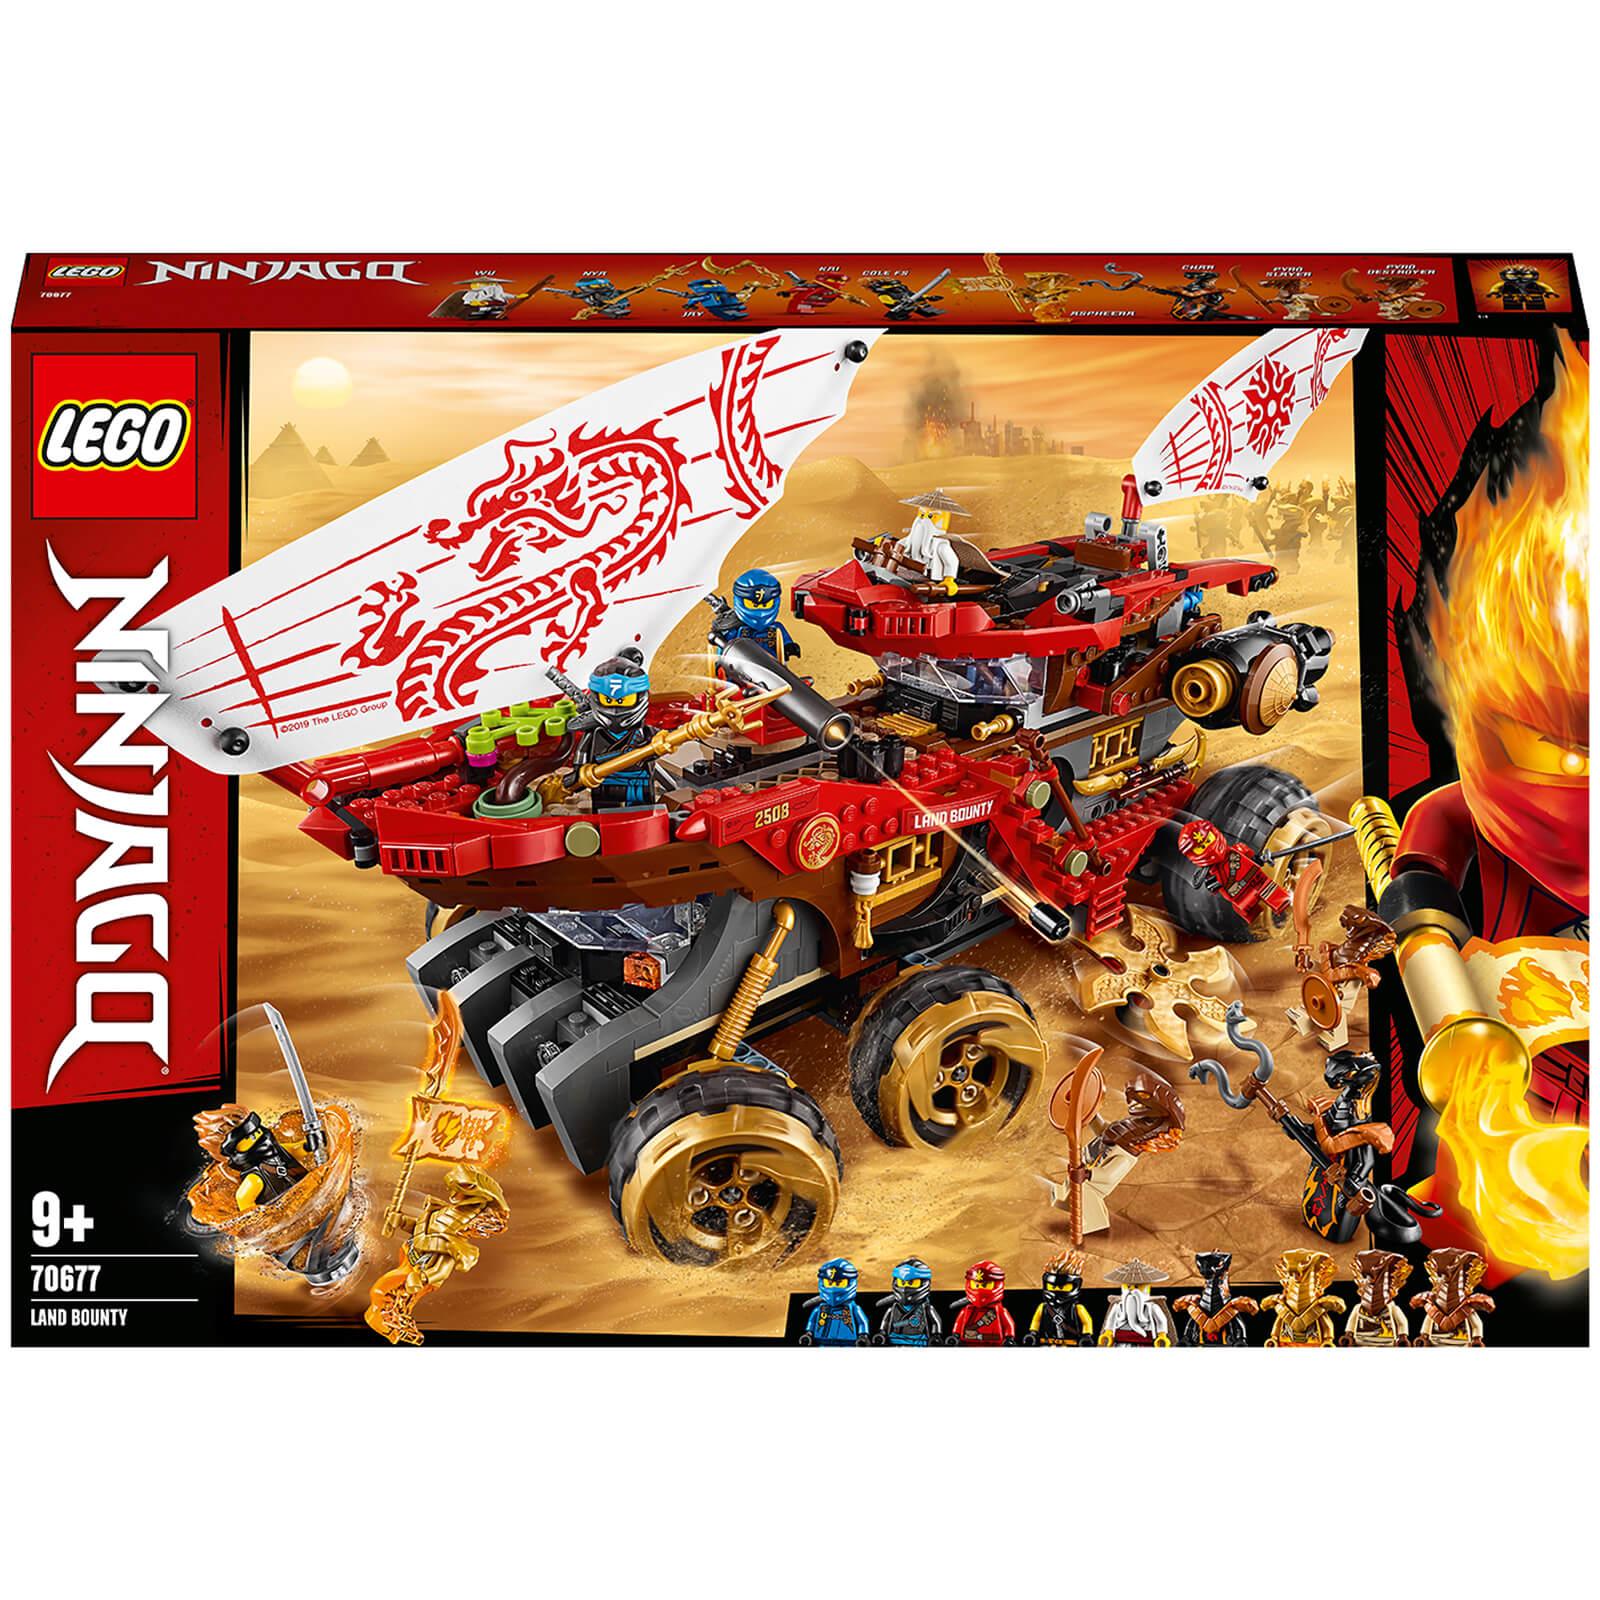 Image of LEGO NINJAGO: Land Bounty Toy Truck Ninja Car for Kids (70677)